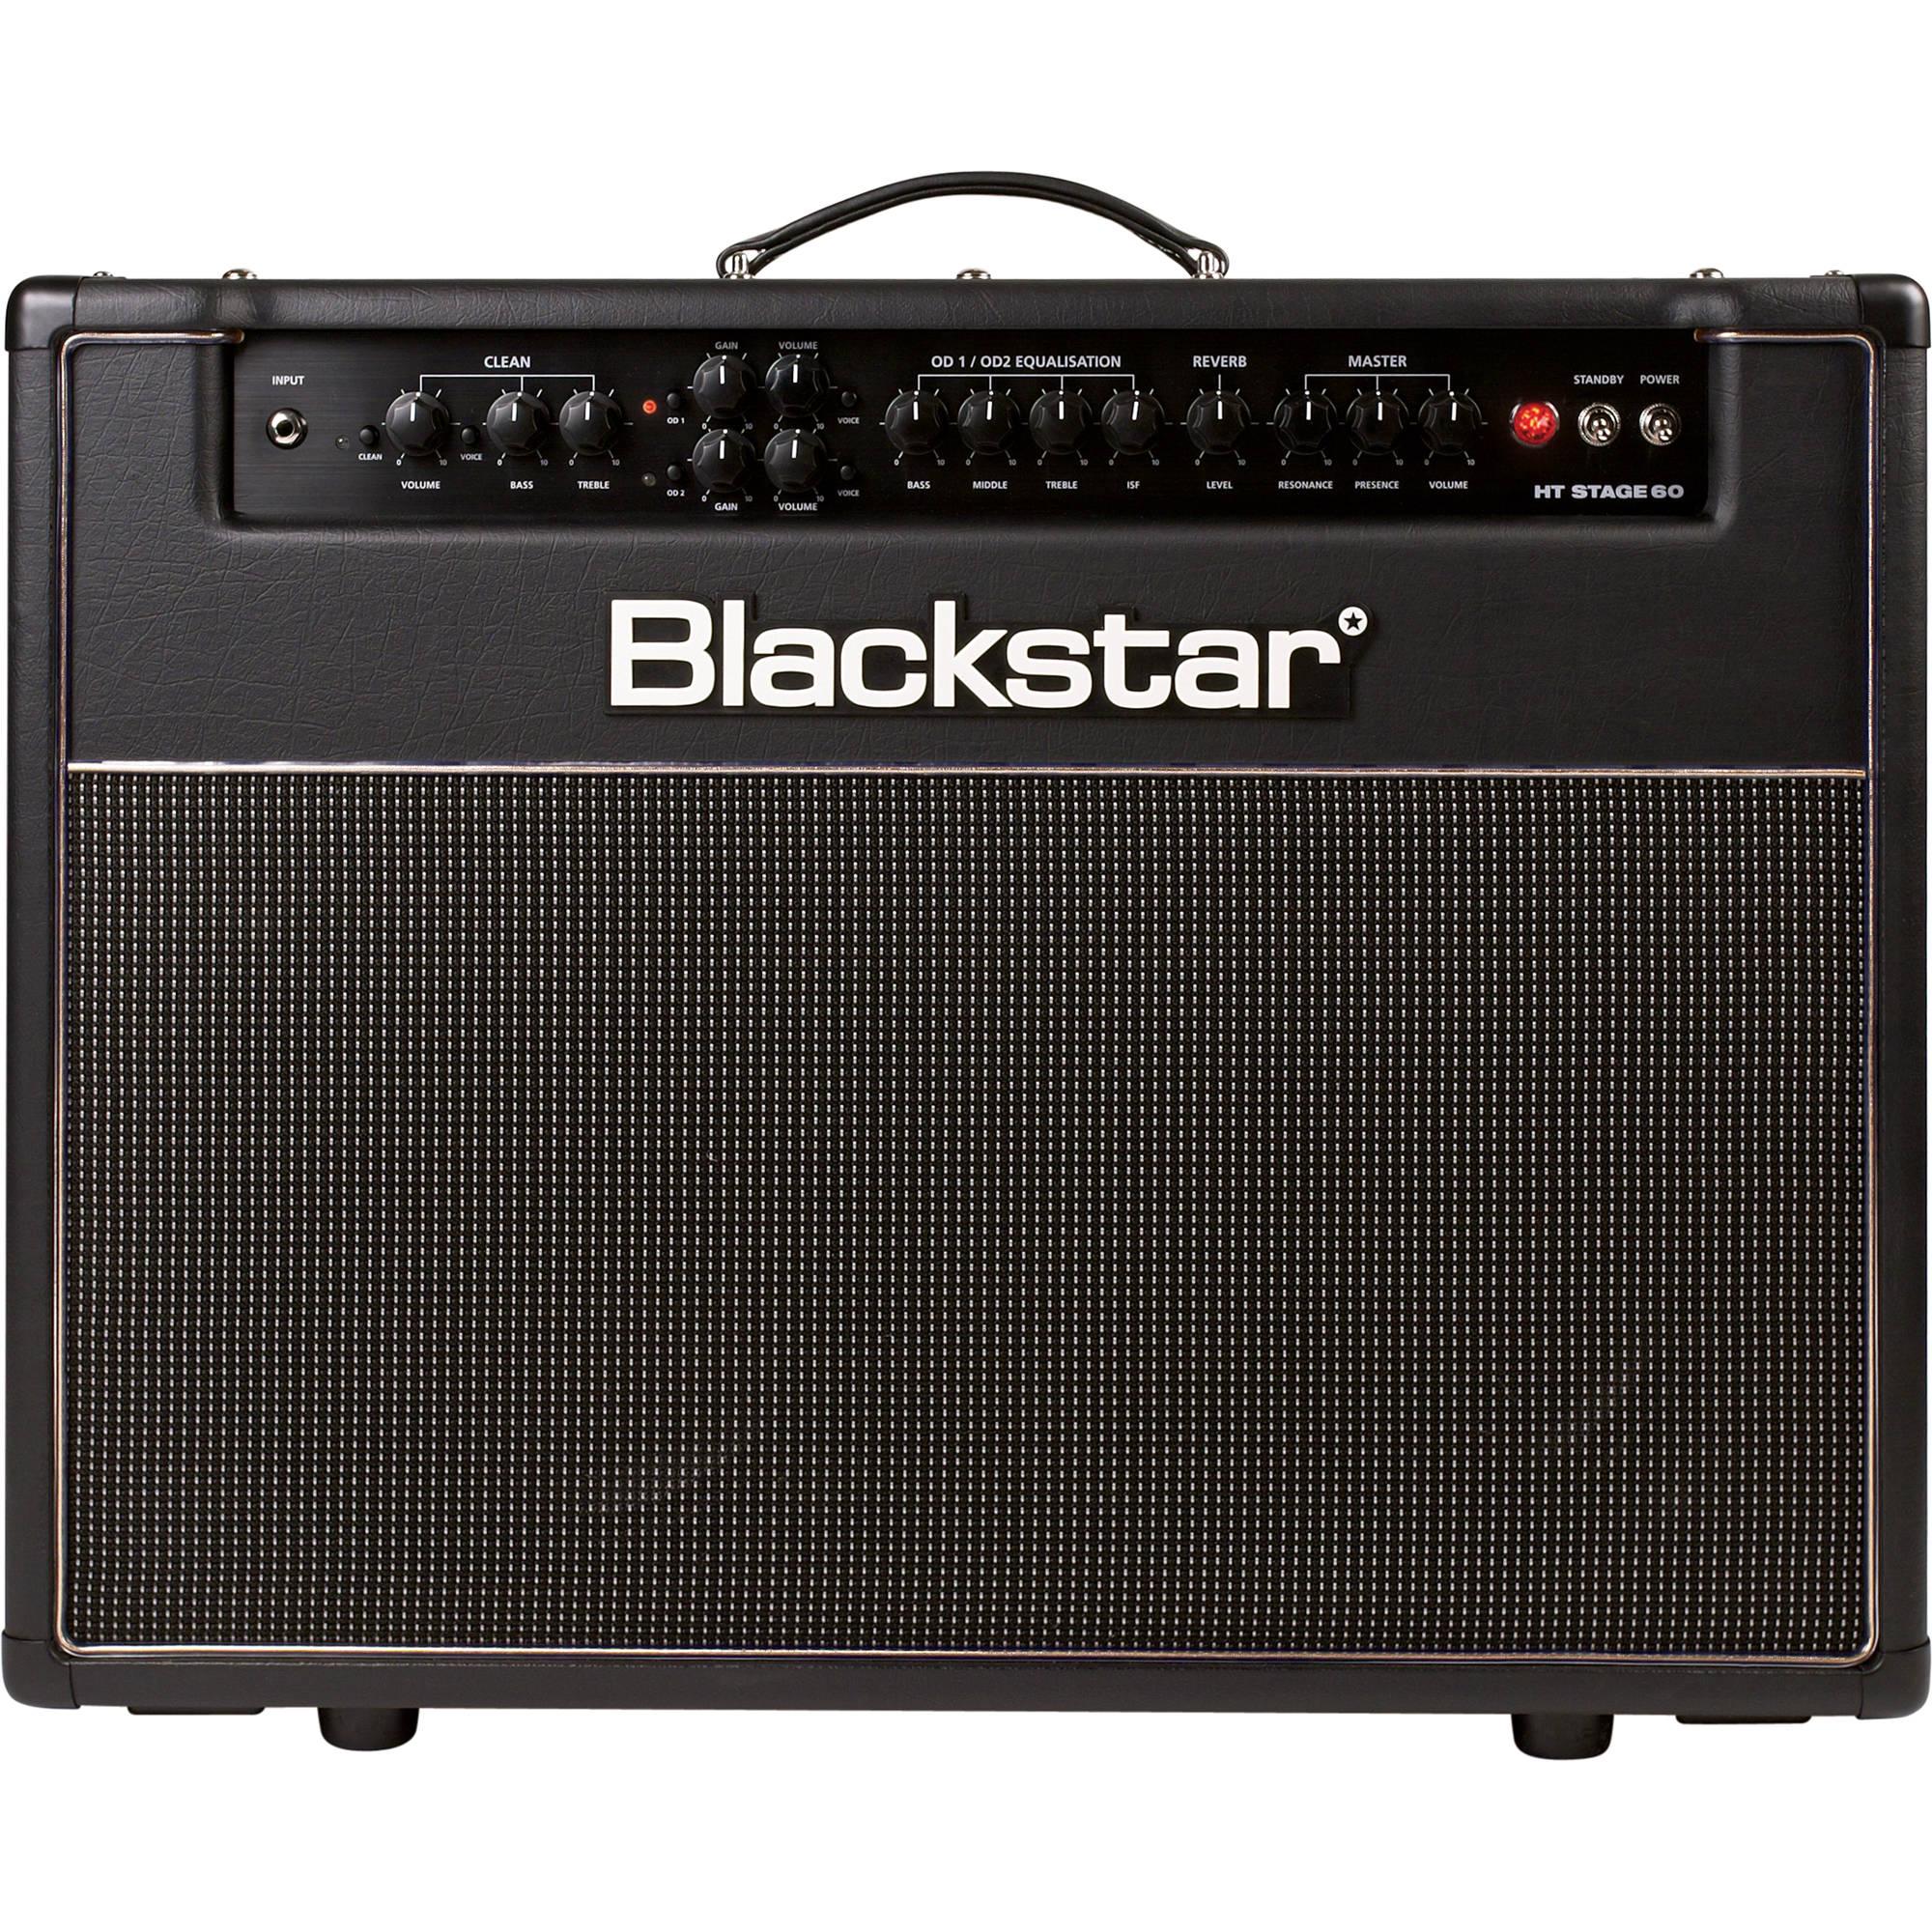 blackstar ht stage 60 2x12 60w guitar combo htstage60c rh bhphotovideo com madison 60w guitar amplifier review rocket 60 ga 60w guitar amplifier